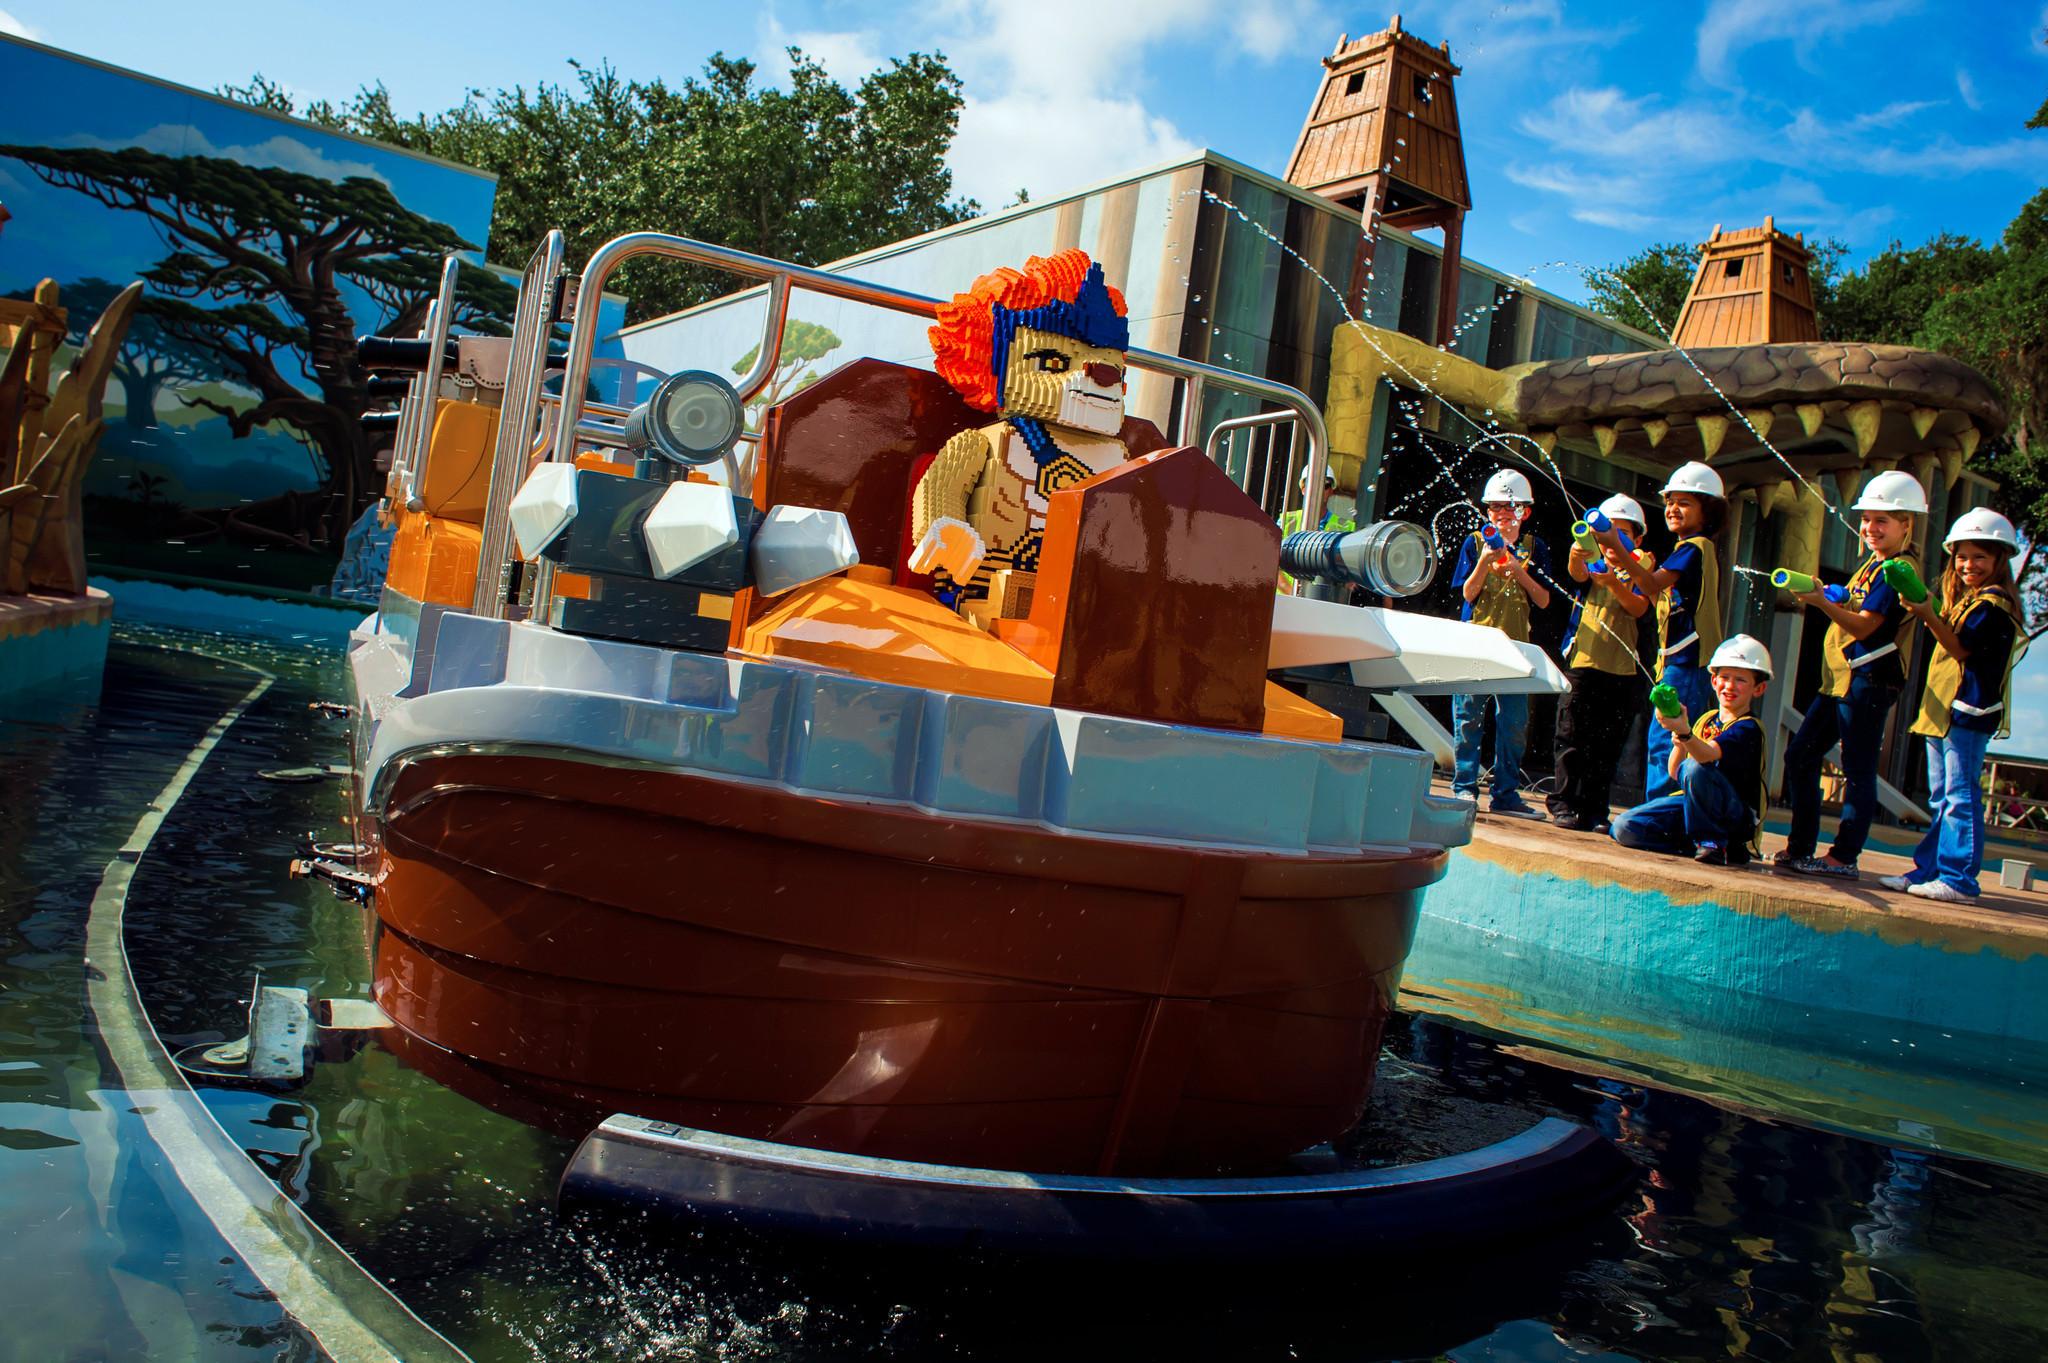 Legoland Florida christens World of Chima ride - Orlando ...